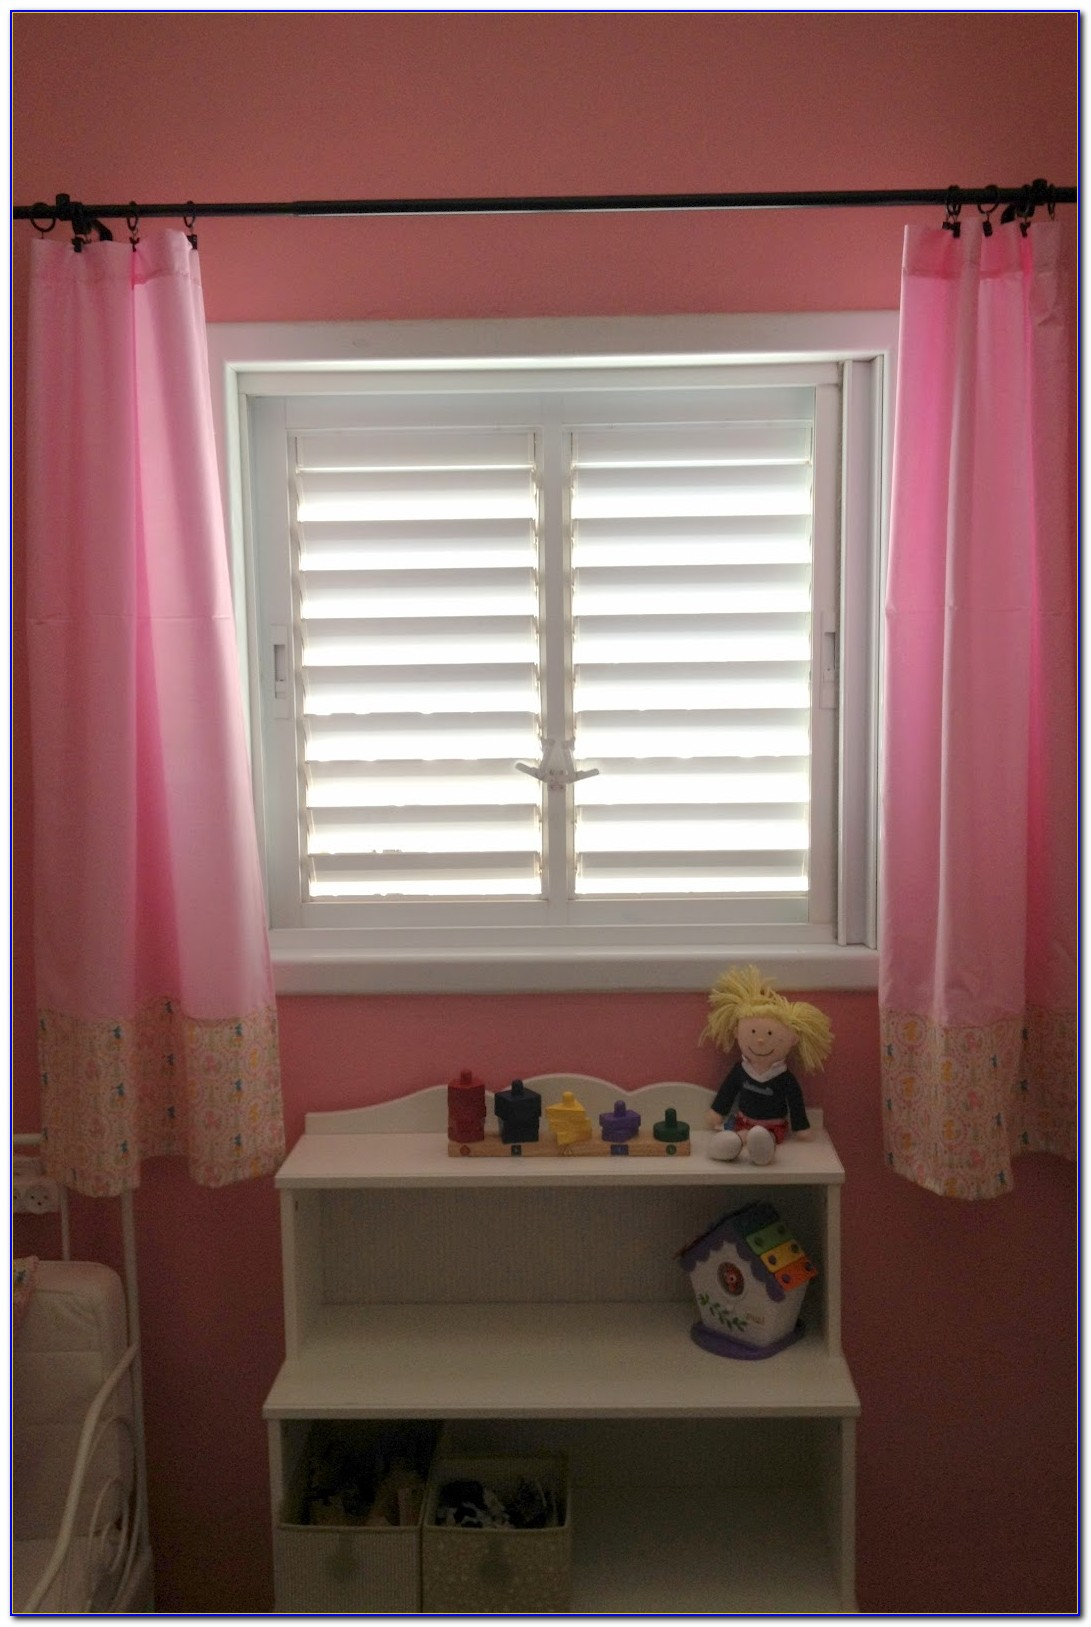 Standard Curtain Sizes Width